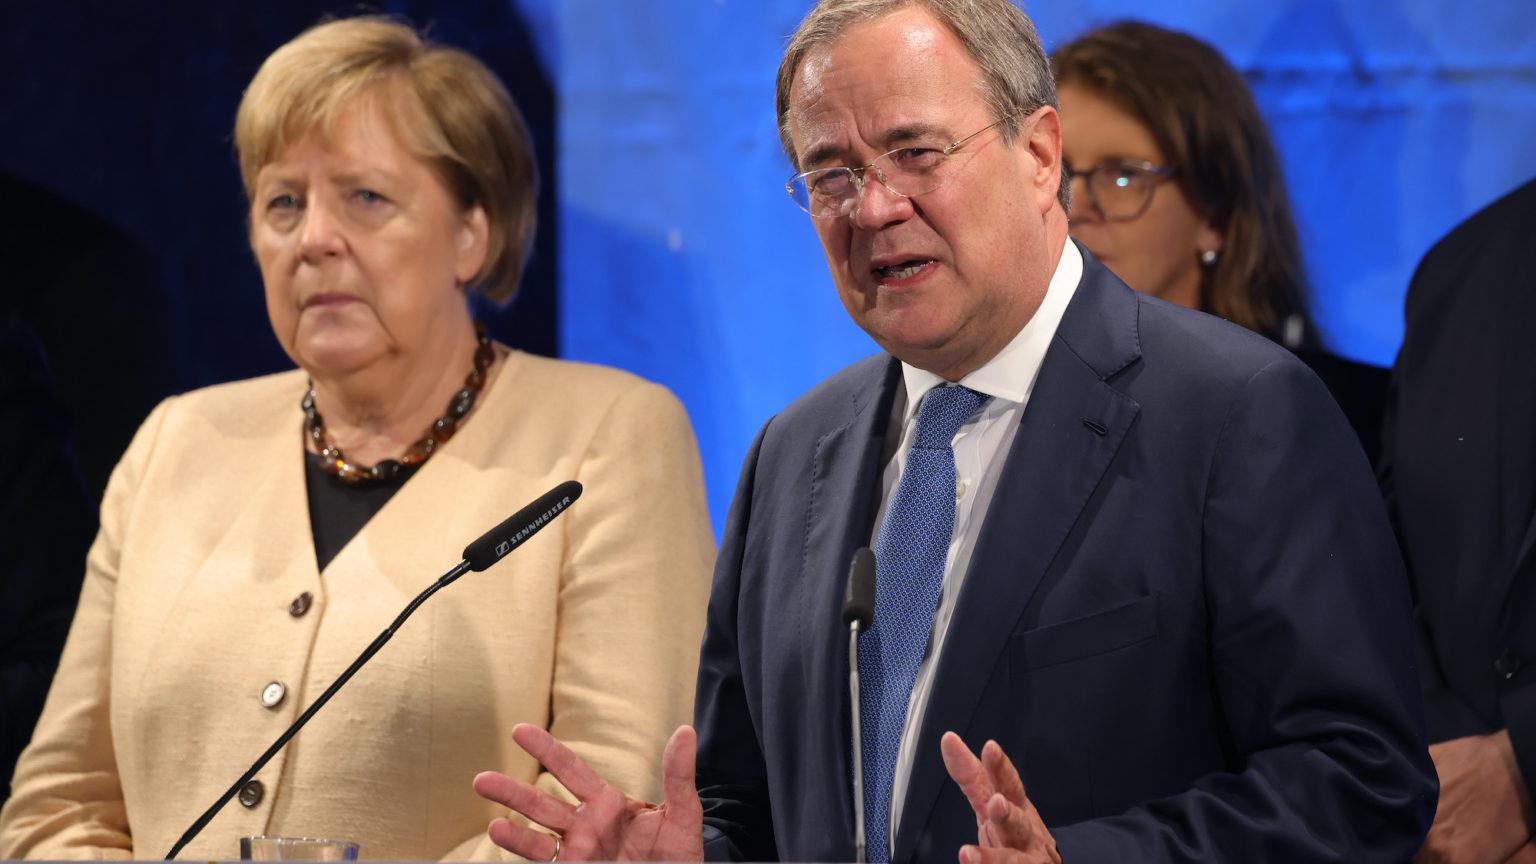 Germany is trapped in Merkel's shadow